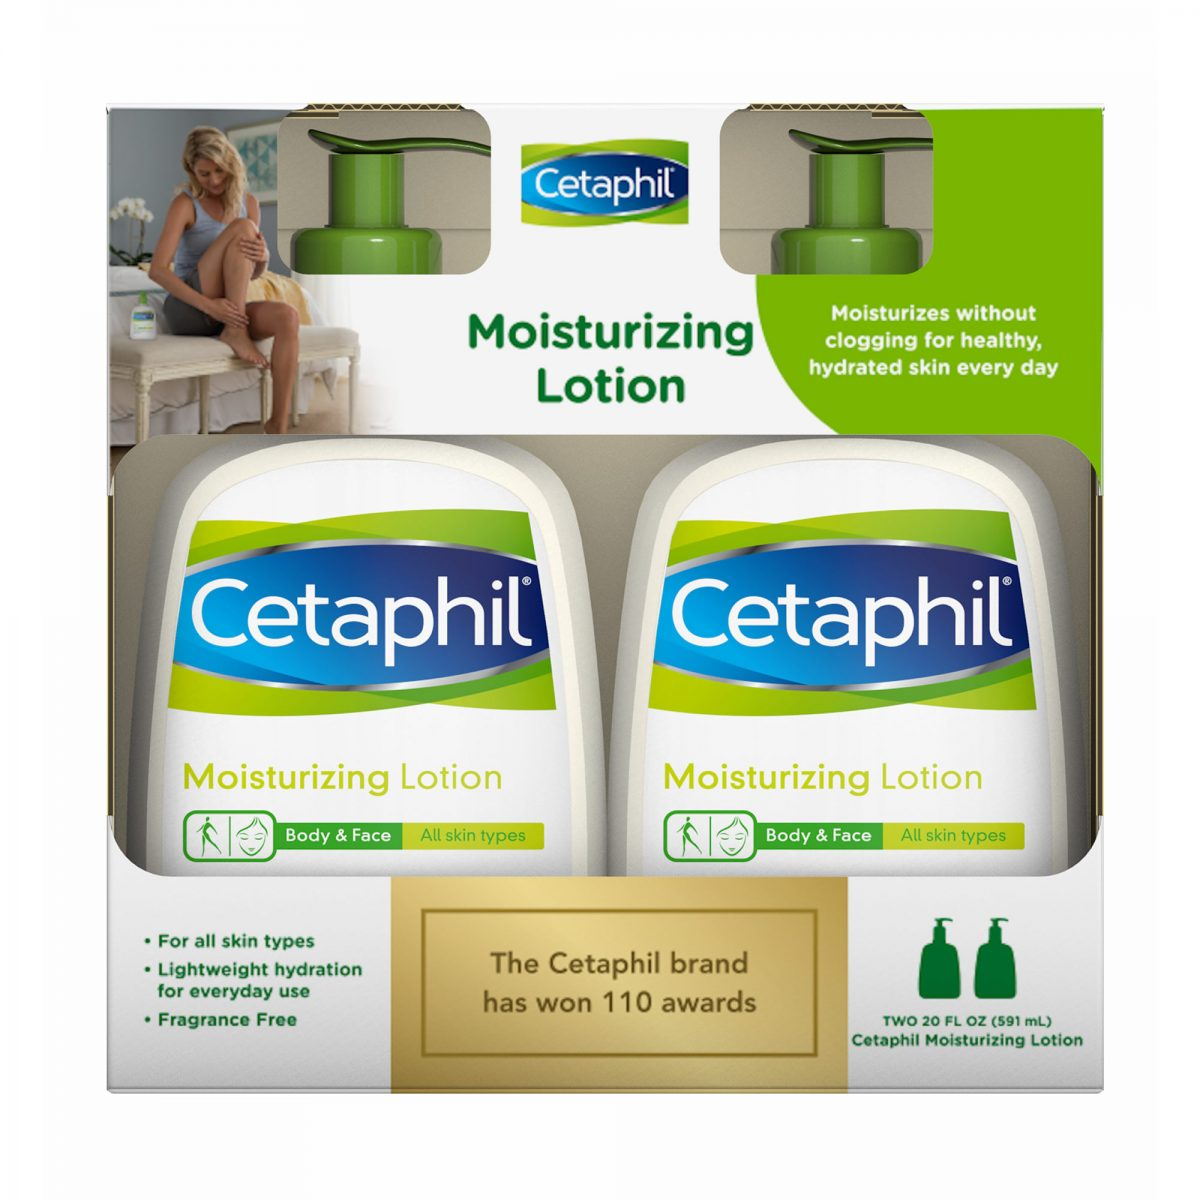 WOW! Save $10 on Cetaphil at BJs!